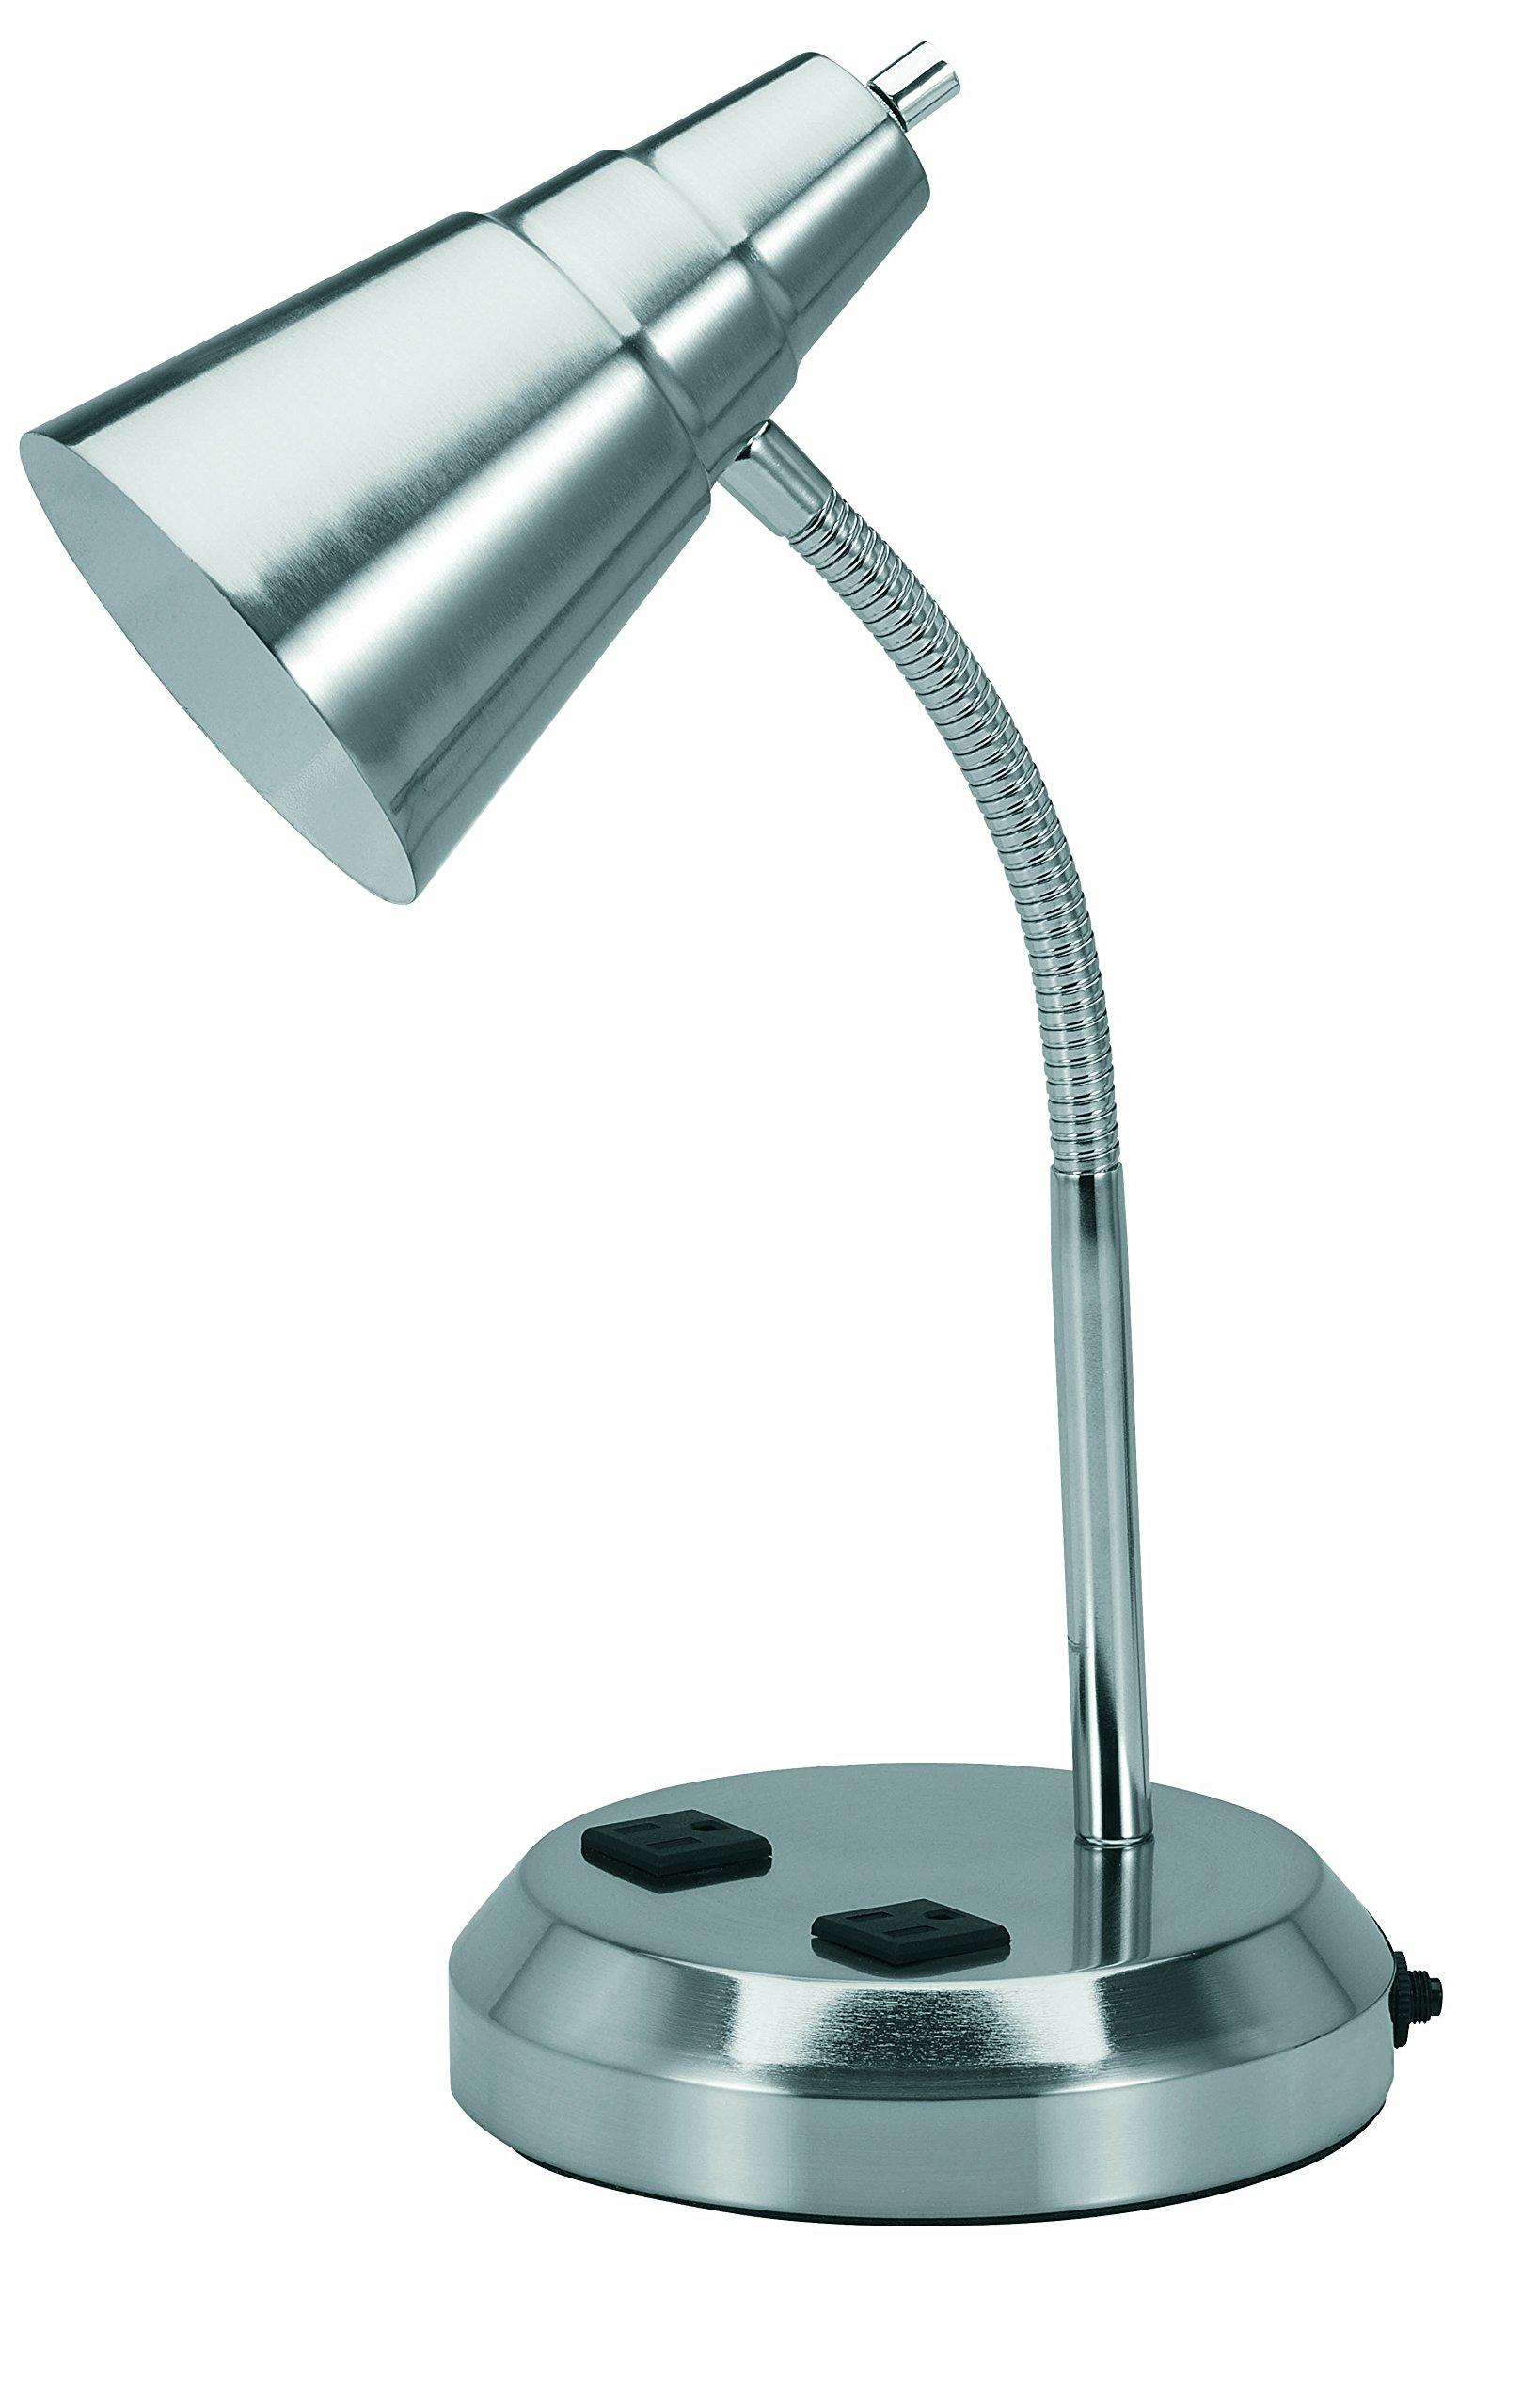 V-LIGHT Charging Outlet CFL Desk Lamp with 2 Grounded 2.5A Power Outlets and Adjustable Gooseneck Arm (VS20105BN)